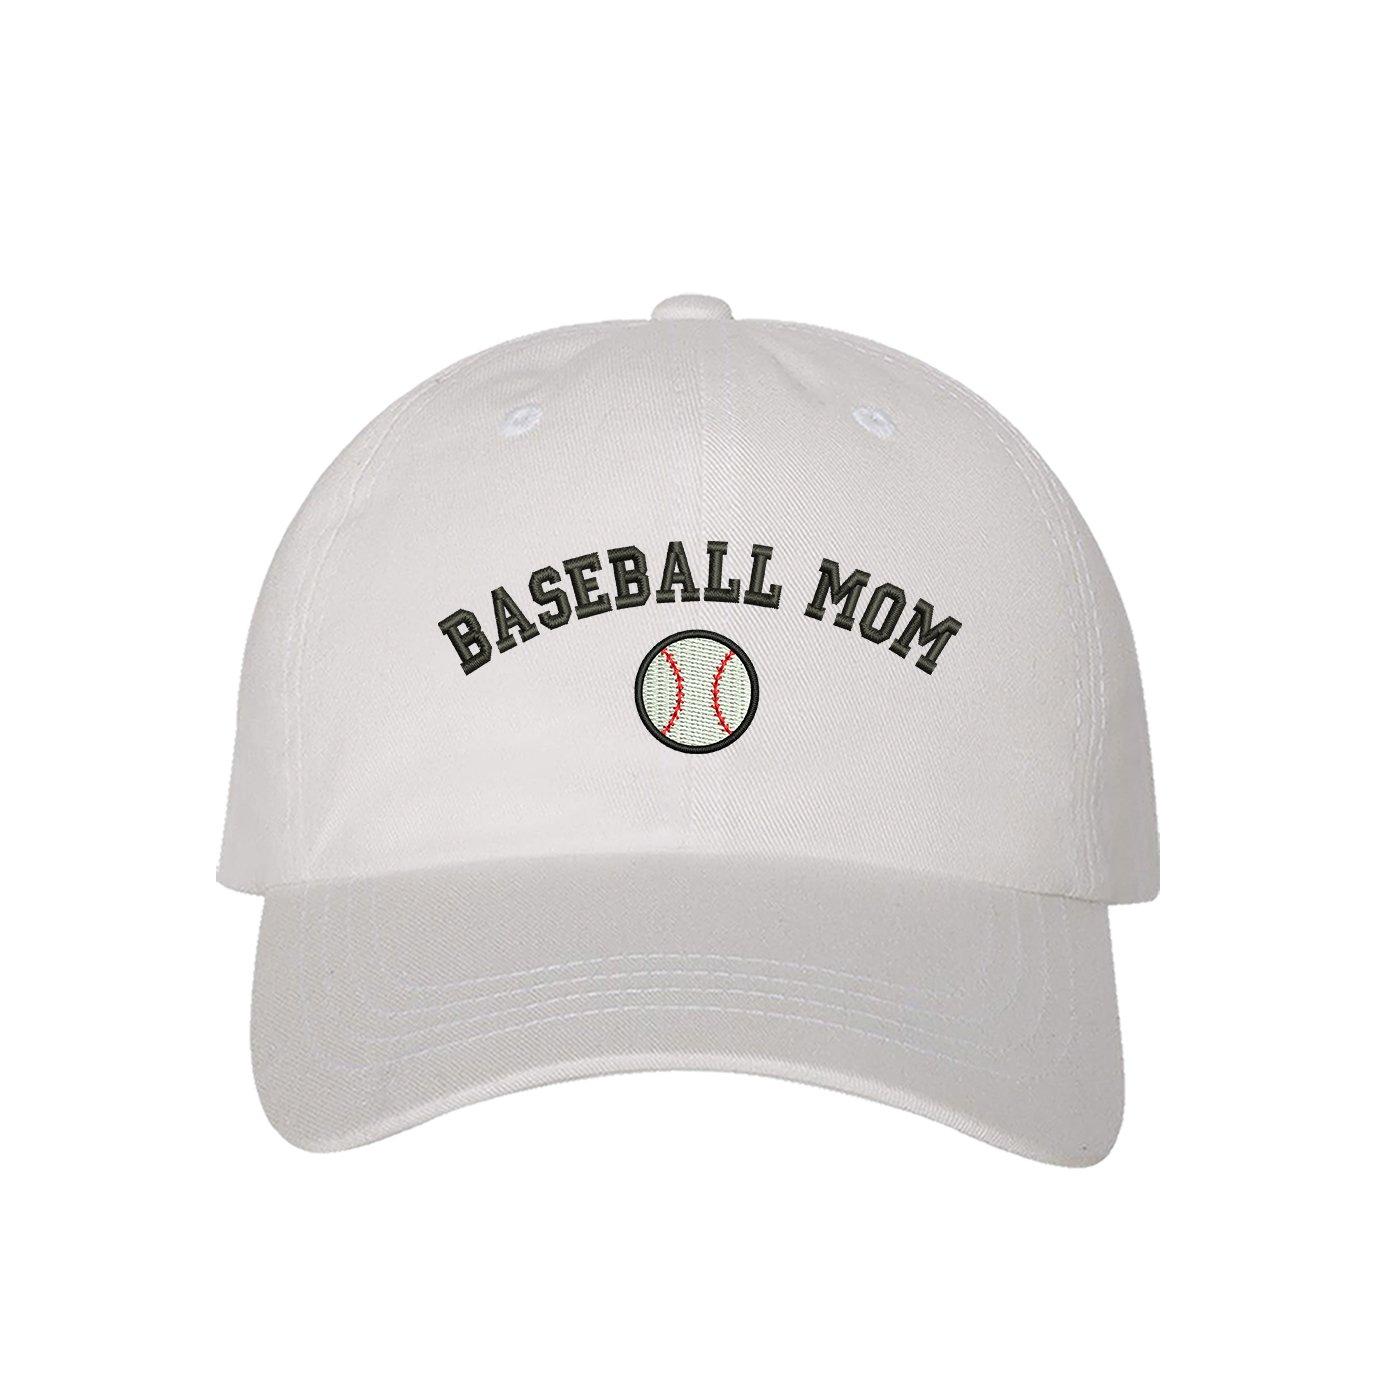 Prfcto Lifestyle Baseball Mom Dad Hat - Black Baseball Hat - Unisex at Amazon  Men s Clothing store  7095debb7b39